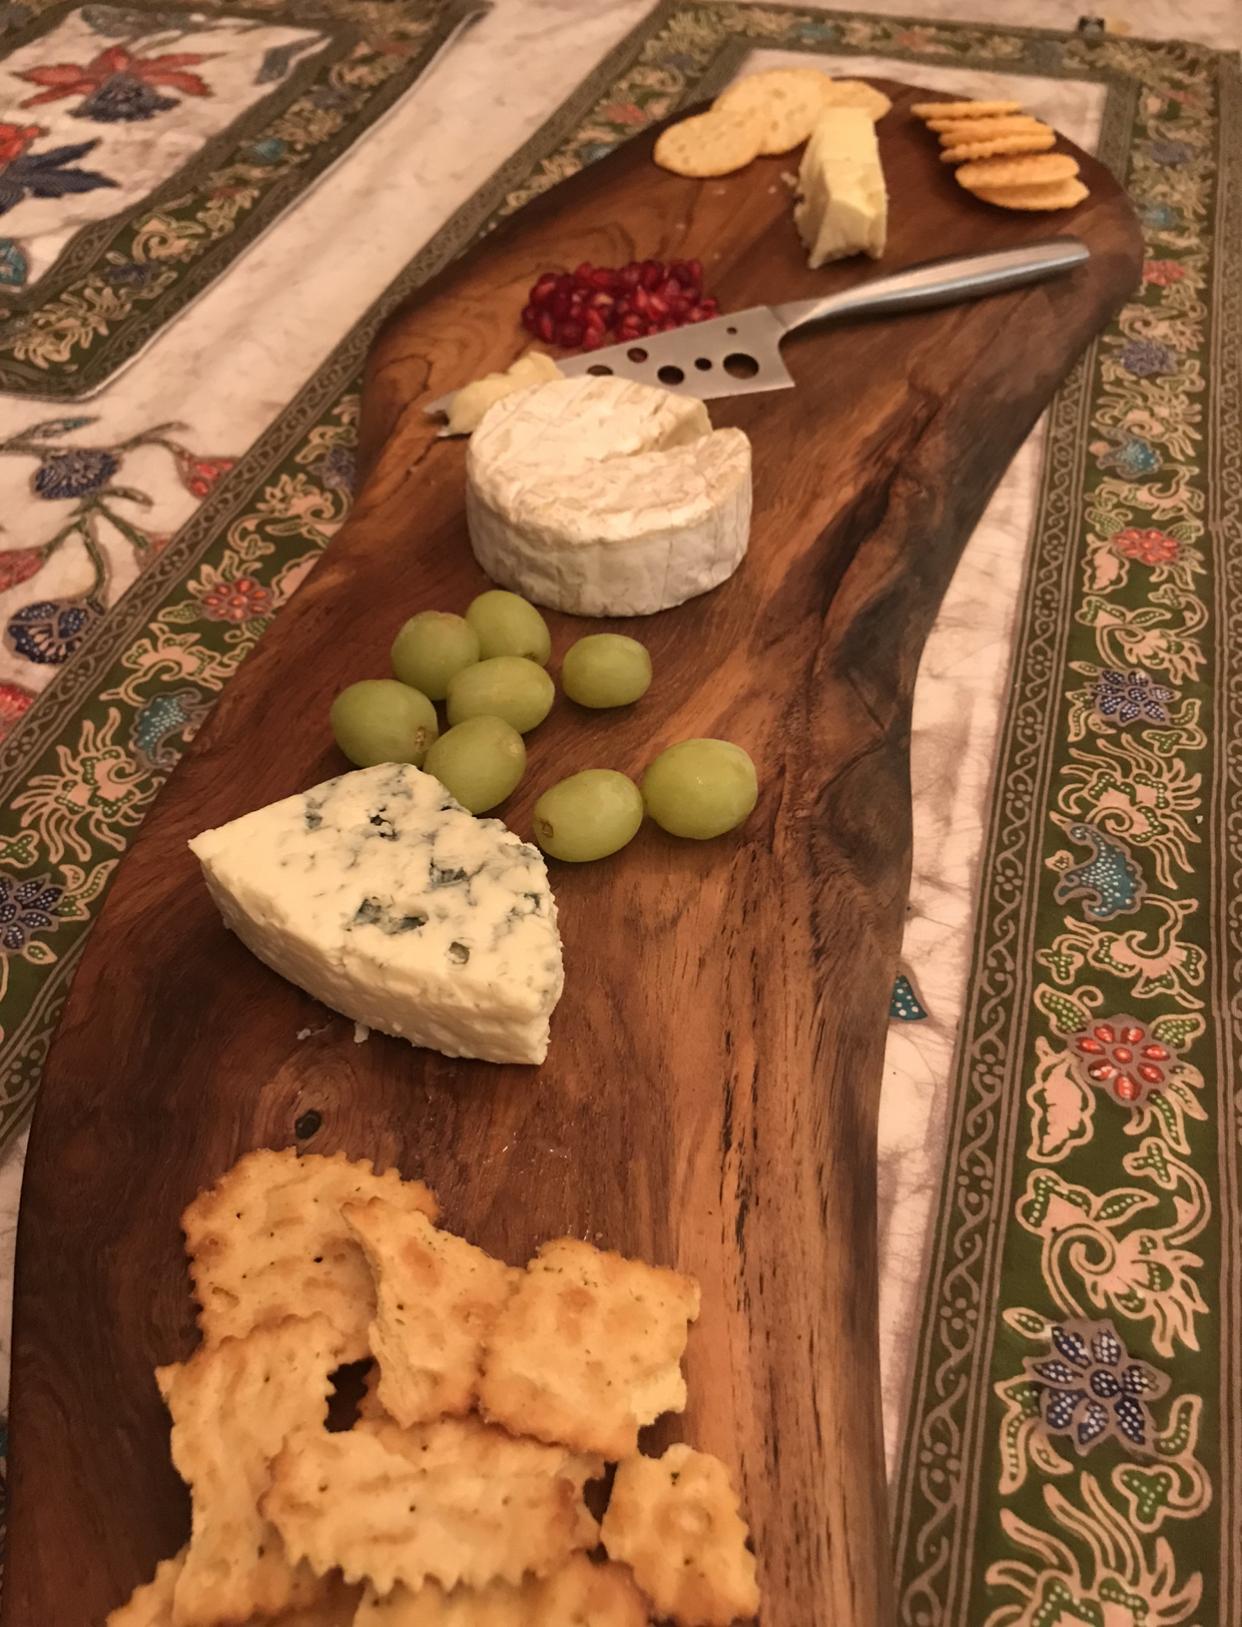 The Teakdoor Cheese Thread-f55ac05c-c24c-4e4e-b8e9-f7db7d10c846-jpeg